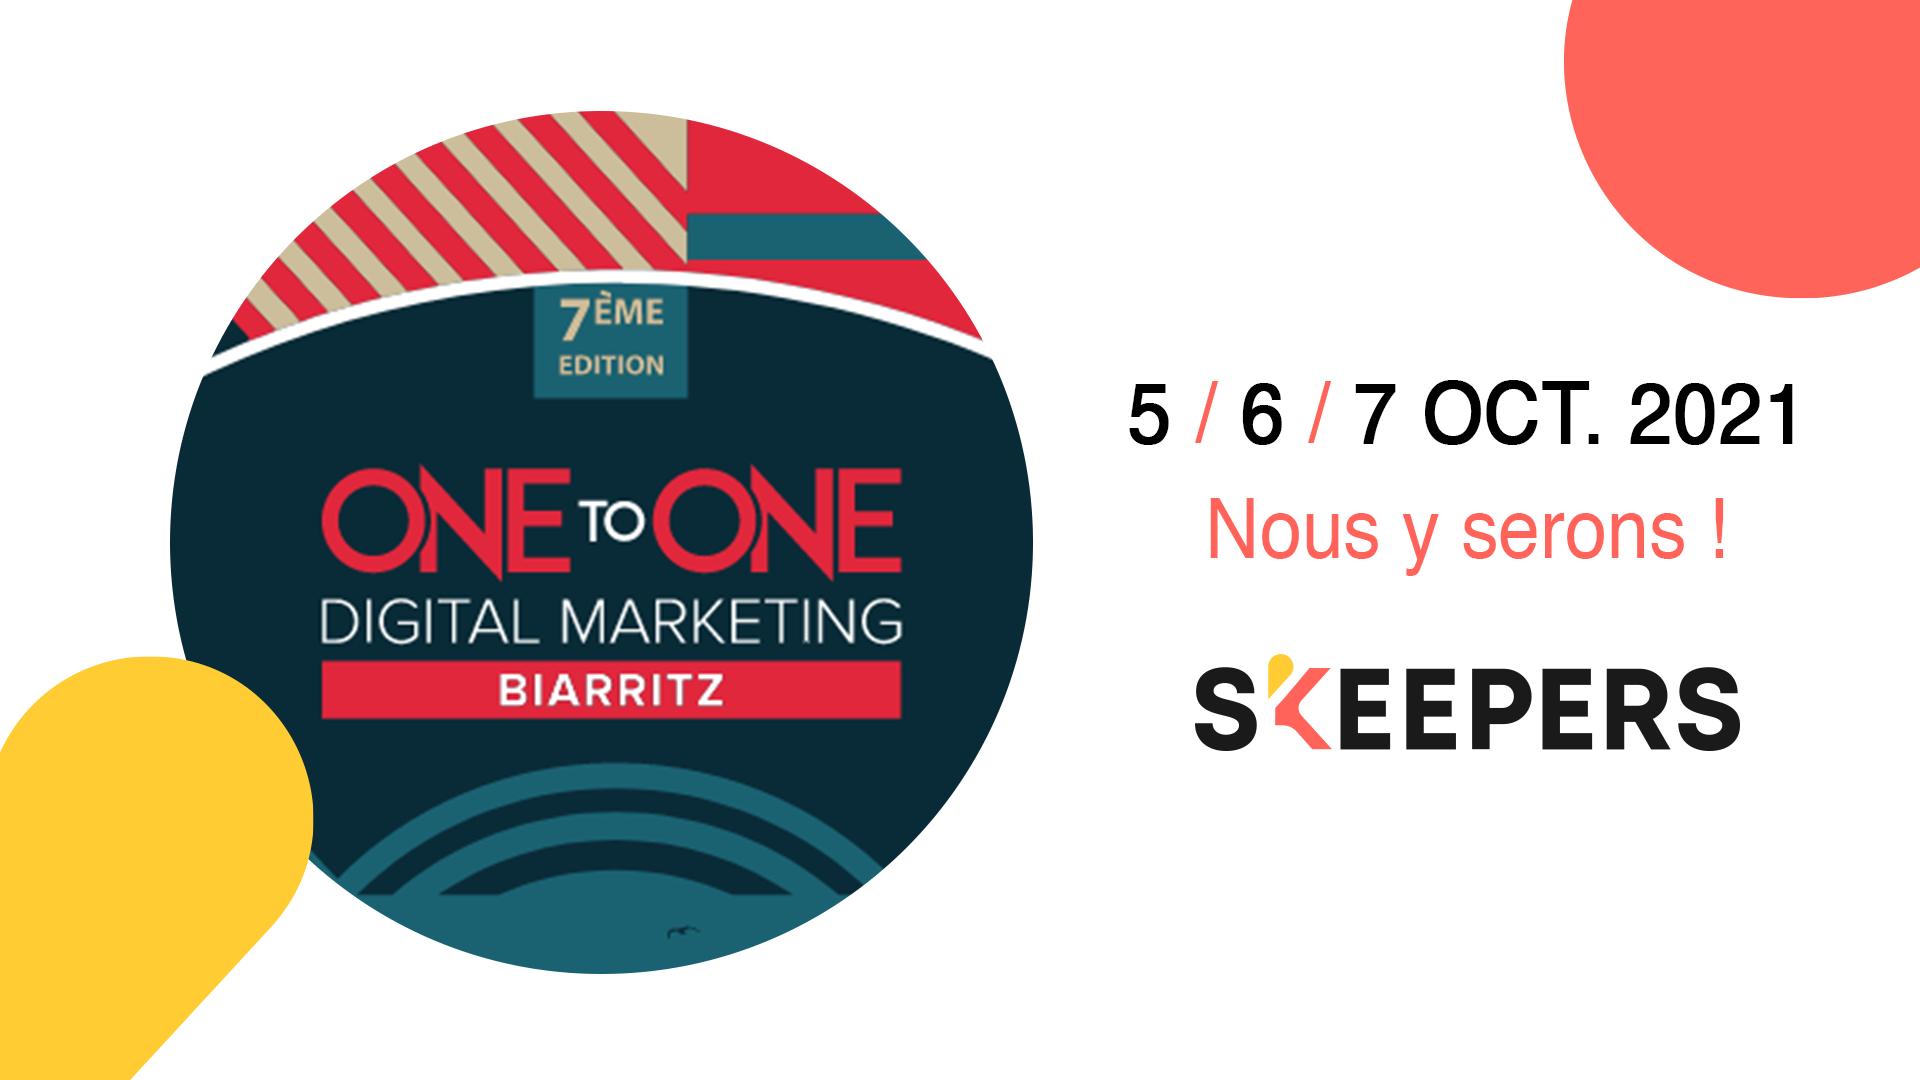 événements SKEEPERS : One to One Biarritz